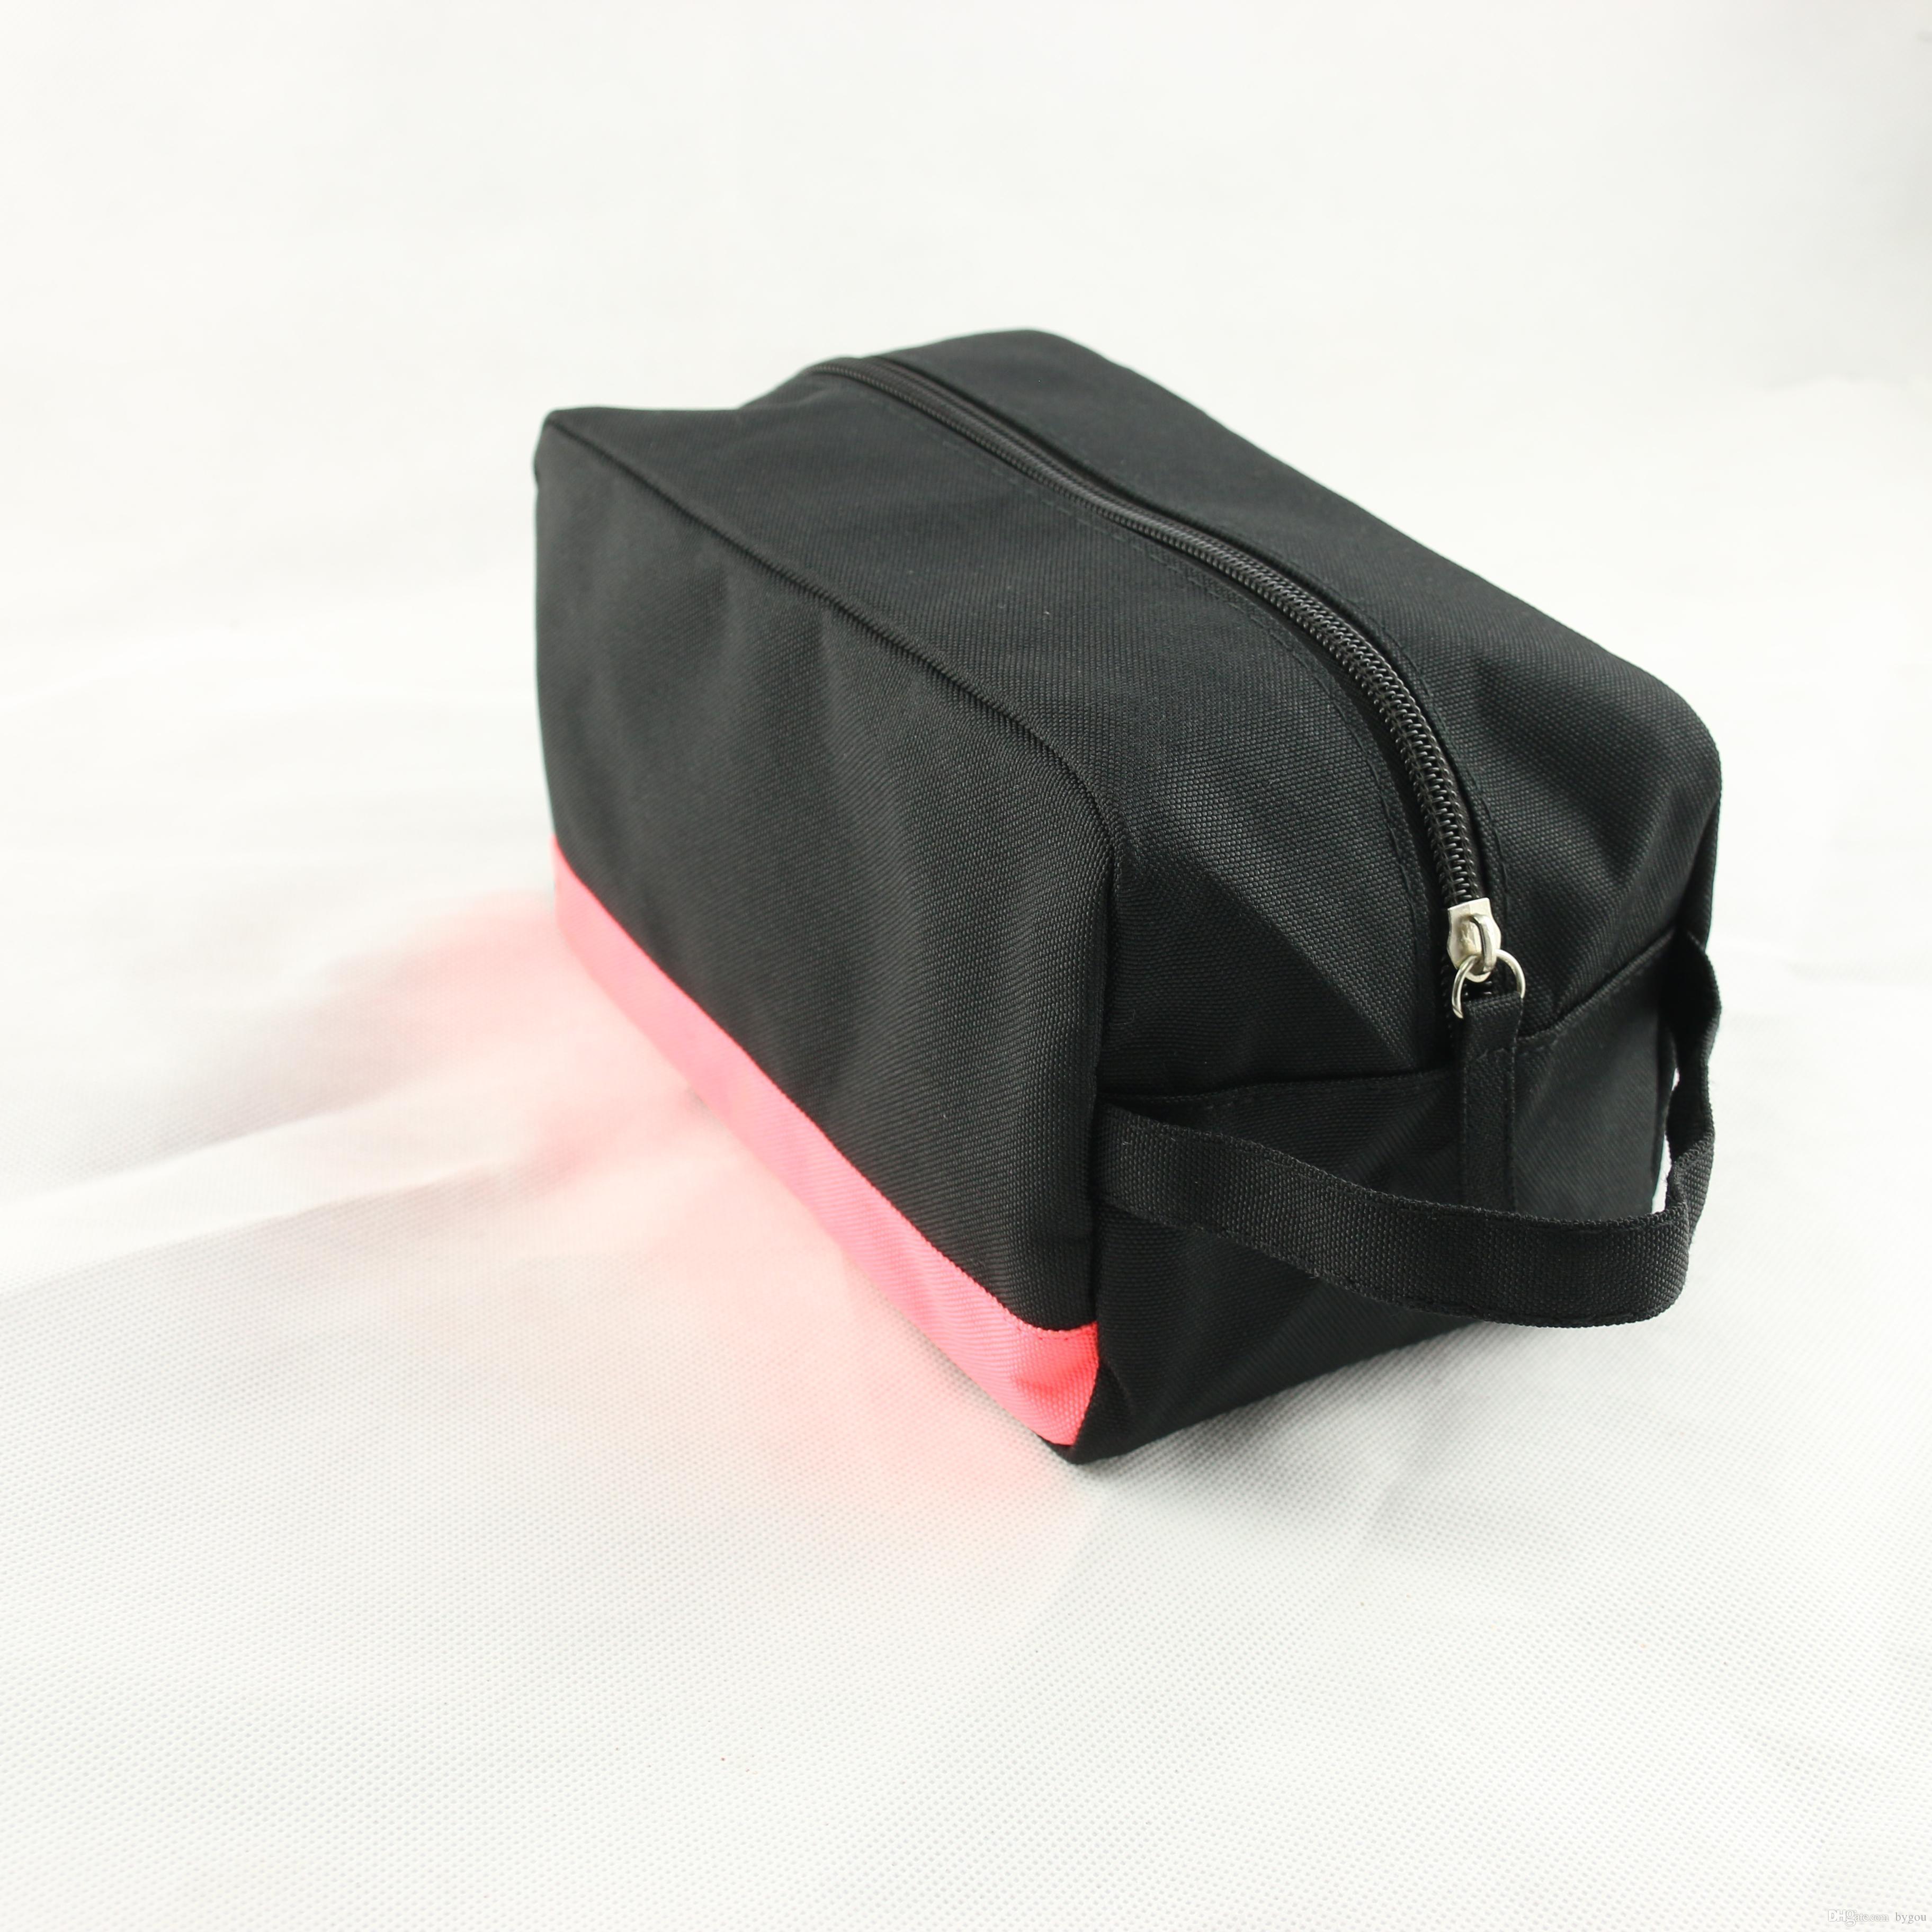 Portable Bag Simple Storage Versatile And Bag 10 Pcs/bag Multifunctional Nylon Portable Storage 900D Wash Cosmetic Travel Waterproo Tfdar